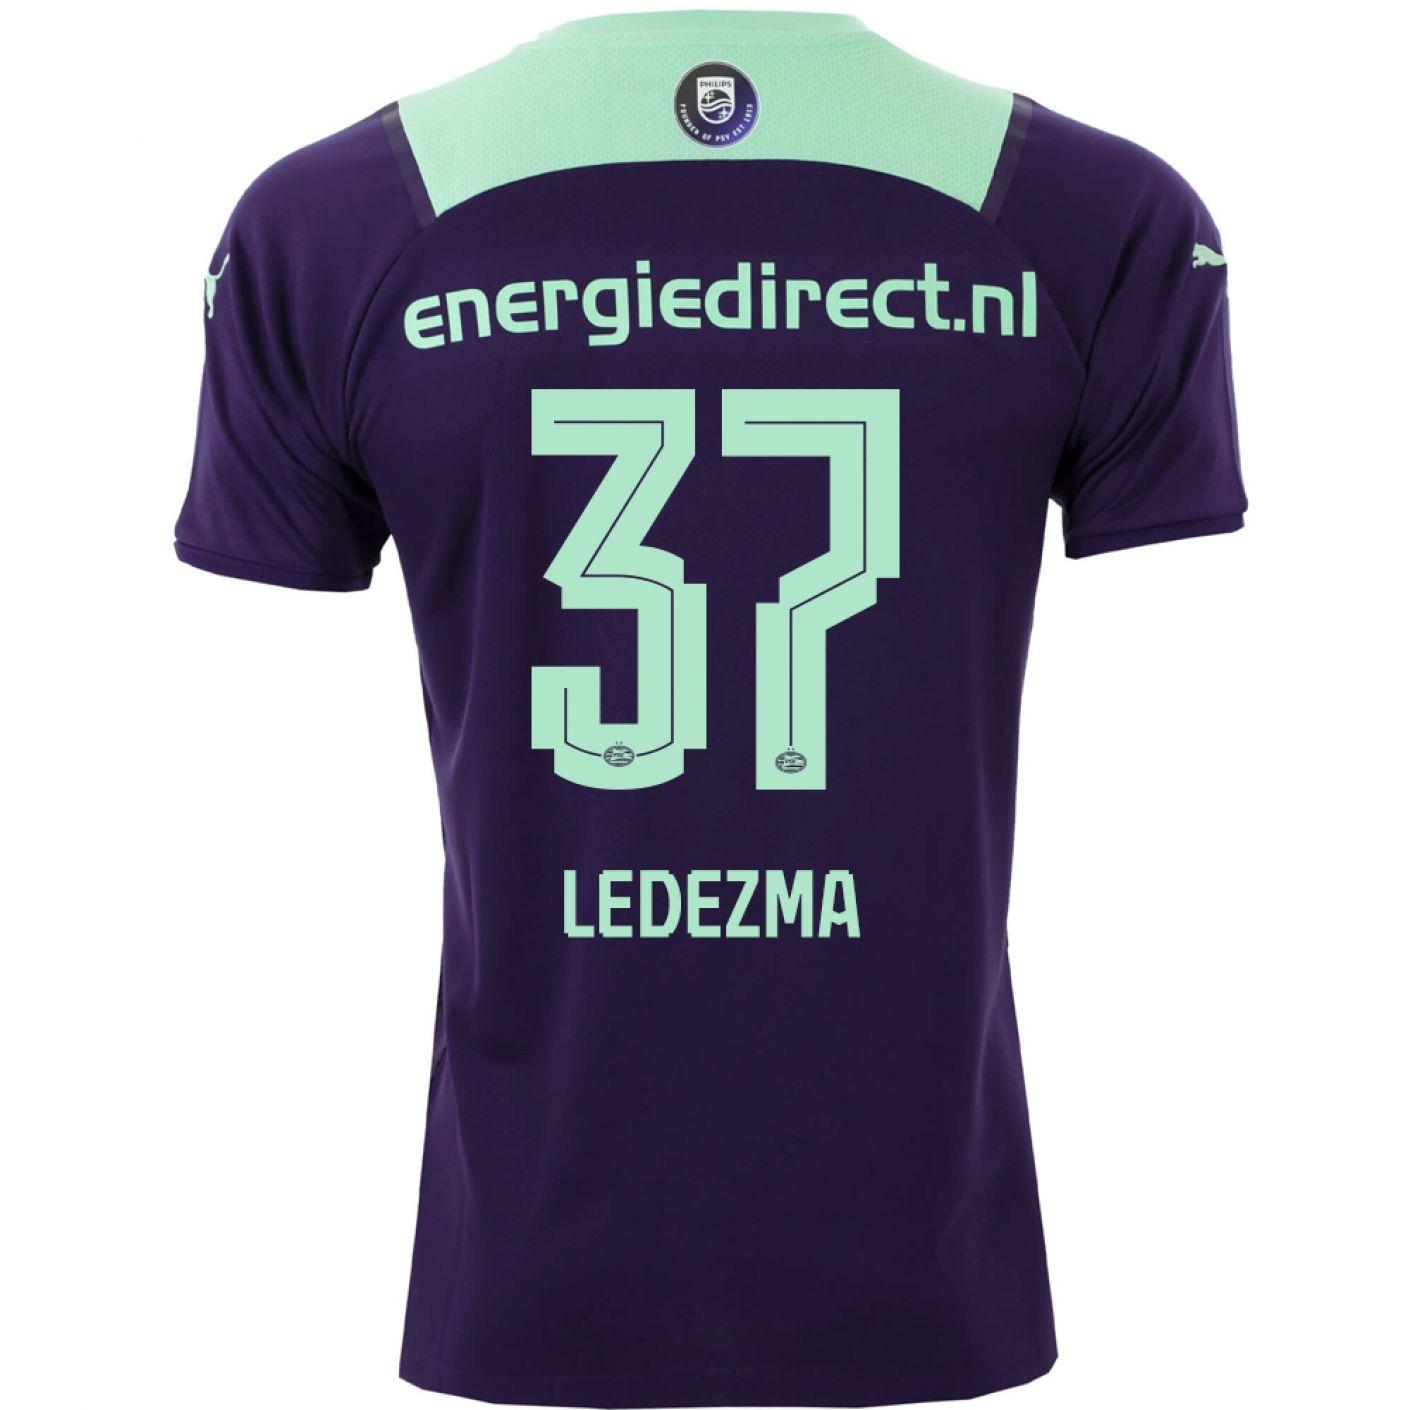 PSV Ledezma 37 Uitshirt 21/22